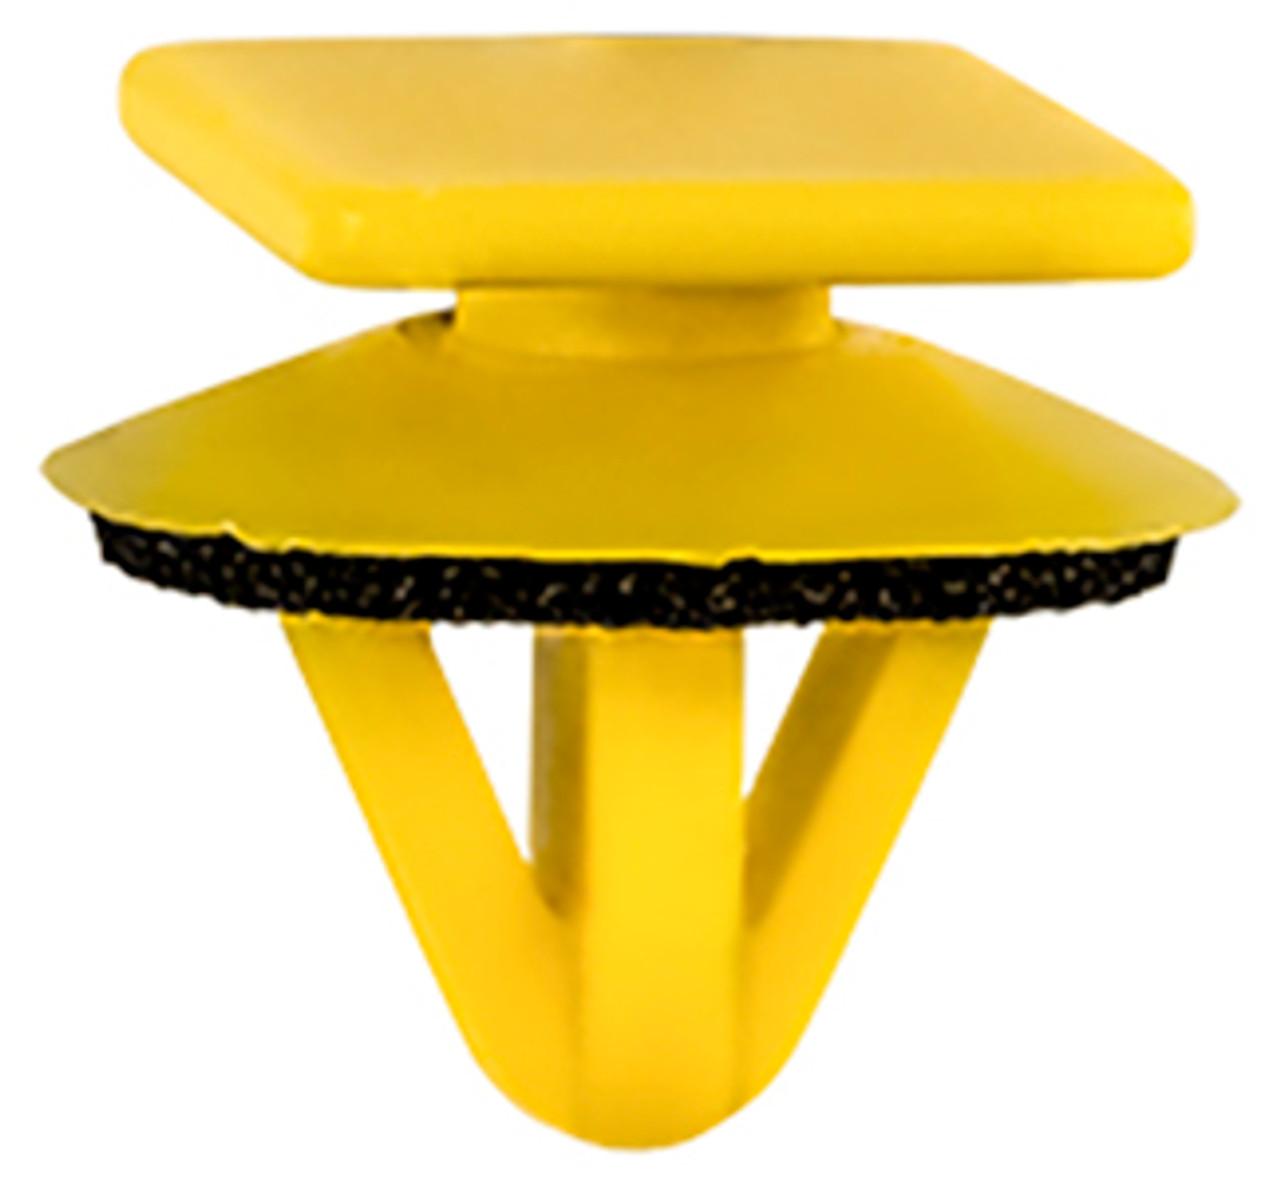 Hood Moulding Clip With Sealer Yellow Nylon Top Head Size: 12mm x 16mm Bottom Head Diameter: 16mm Stem Diameter: 9.5mm Stem Length: 10mm Hyundai Elantra 2006 - 01 OEM# 87703-H1000 25 Per Box